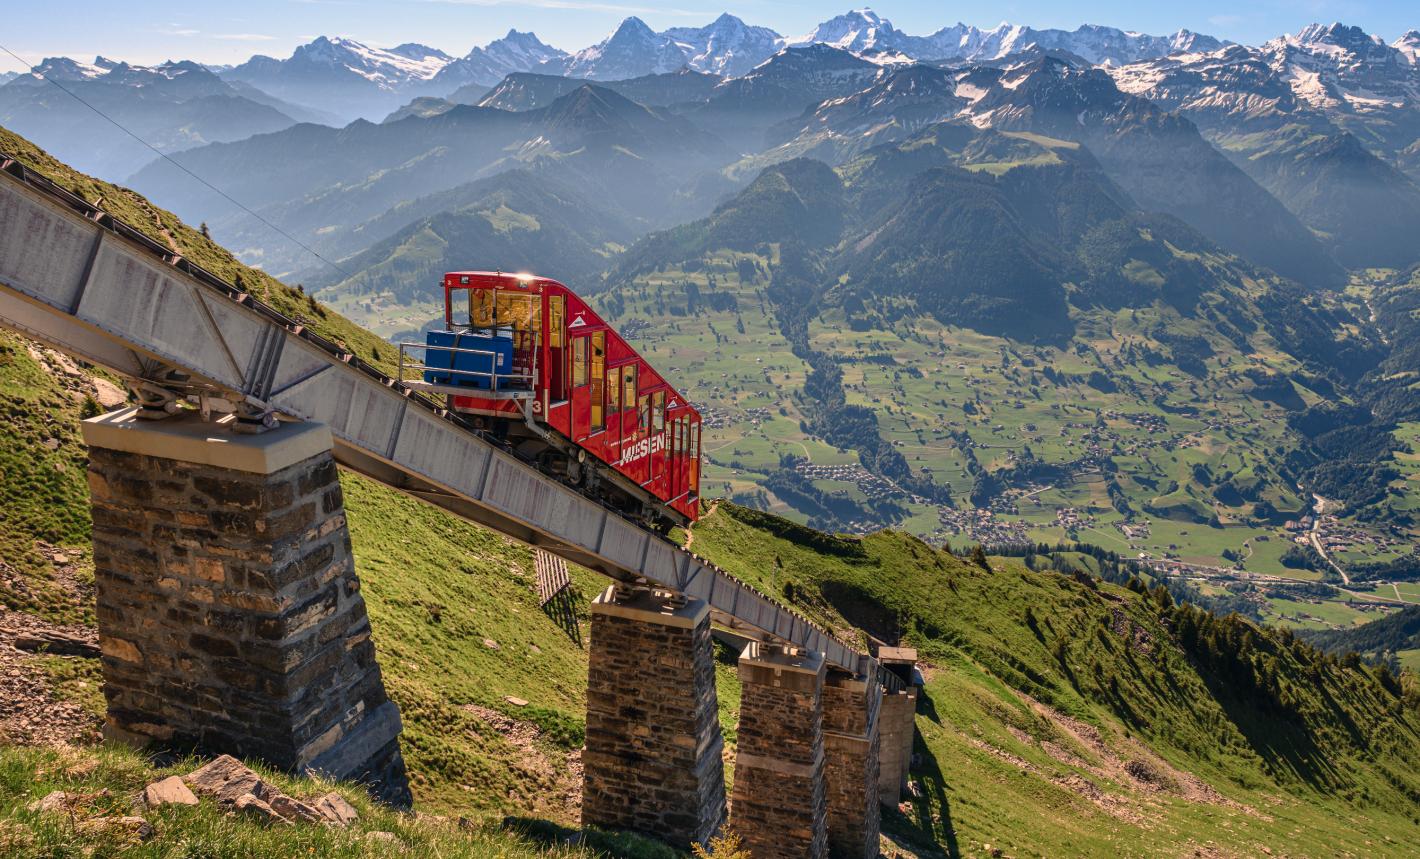 The Niesenbahn during the ascent. Photographer: Chris Dittmer